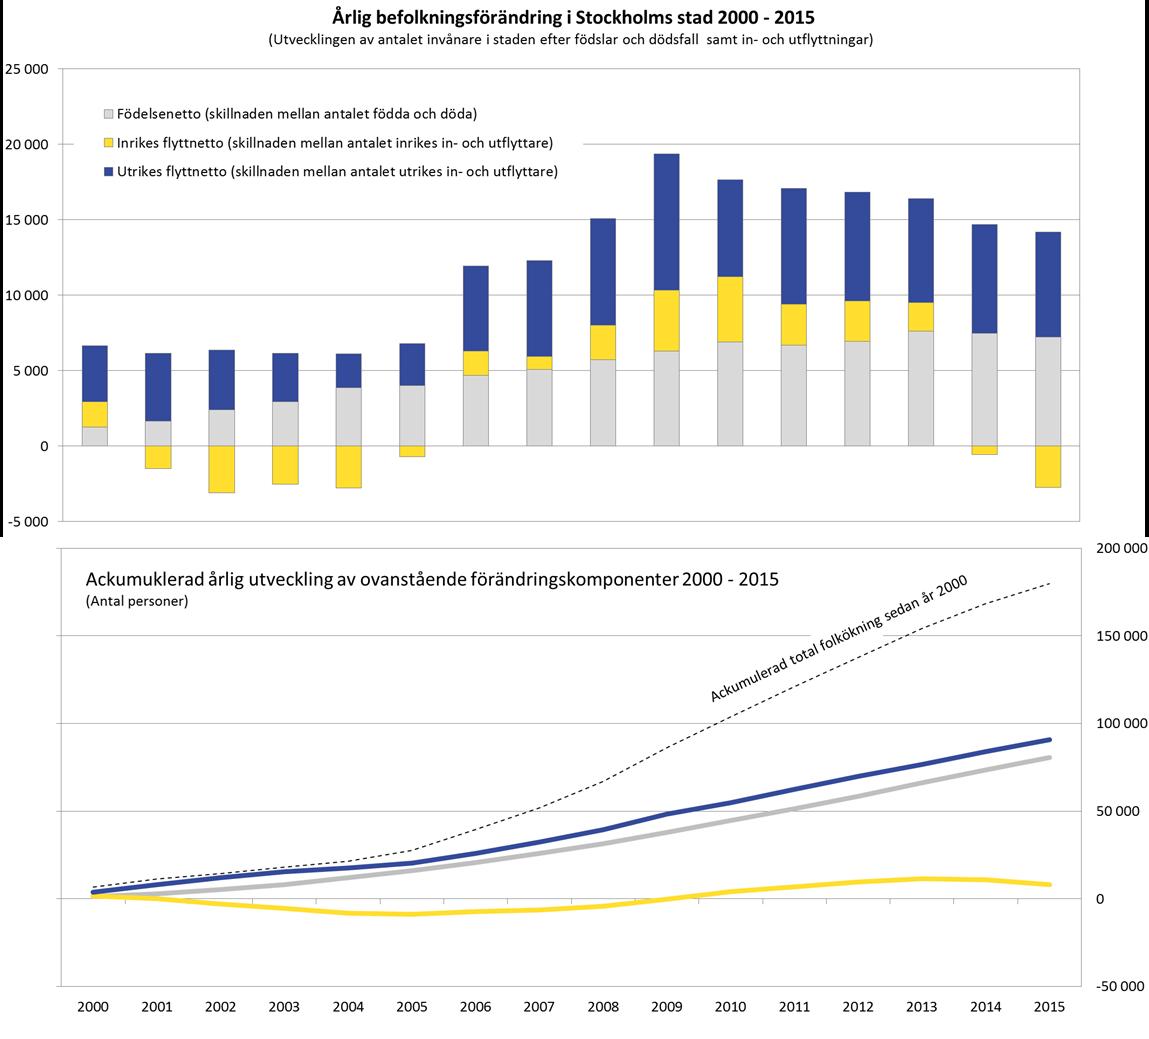 befolkningsforandring_stockholm_2000-2015